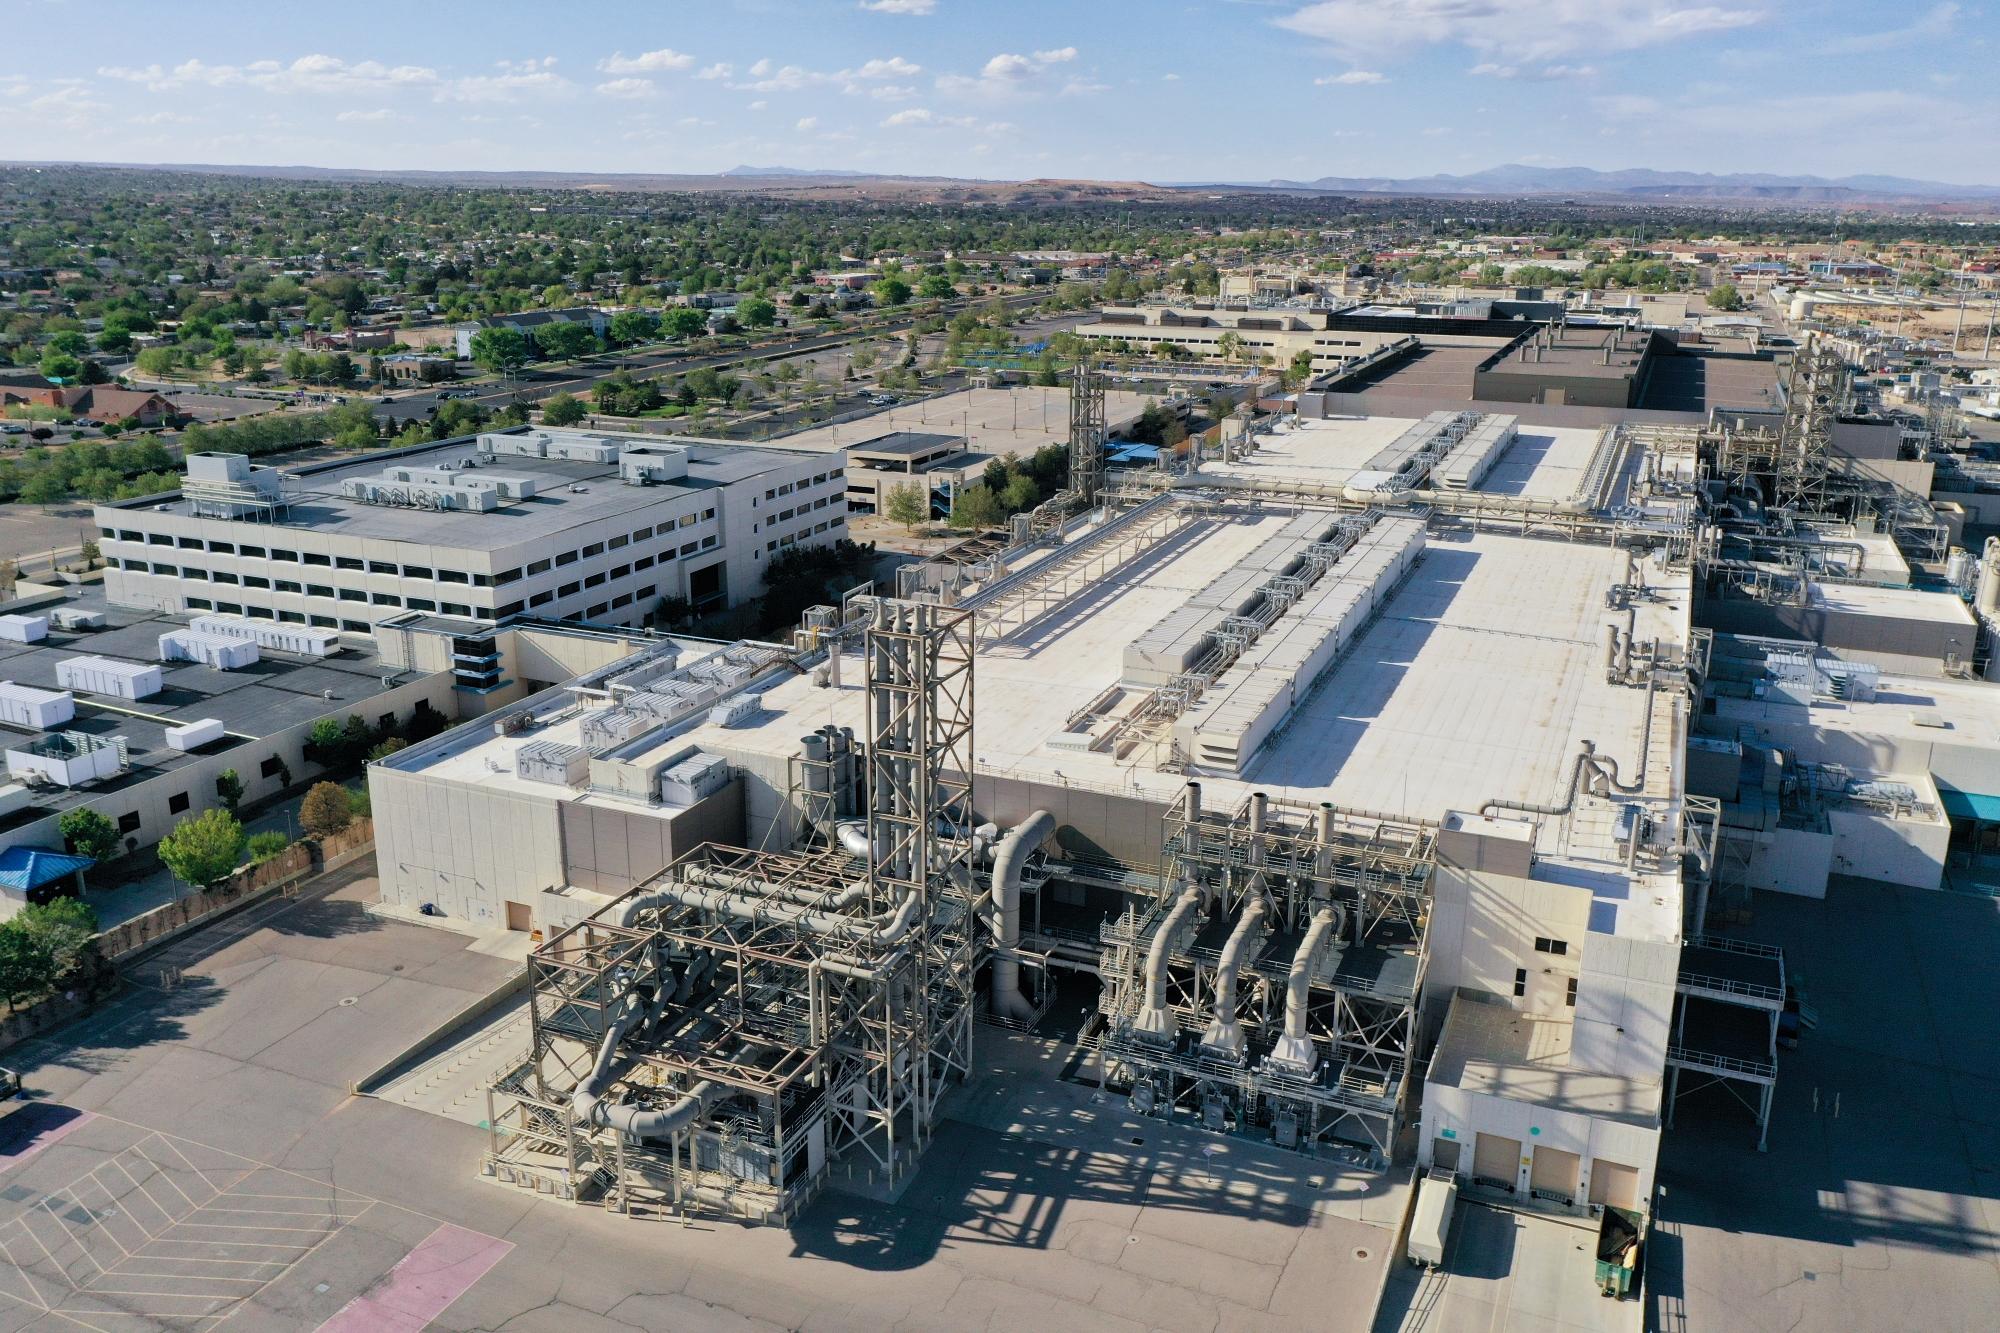 Intel New Mexico plant gets $3.5bn upgrade amid chip shortage